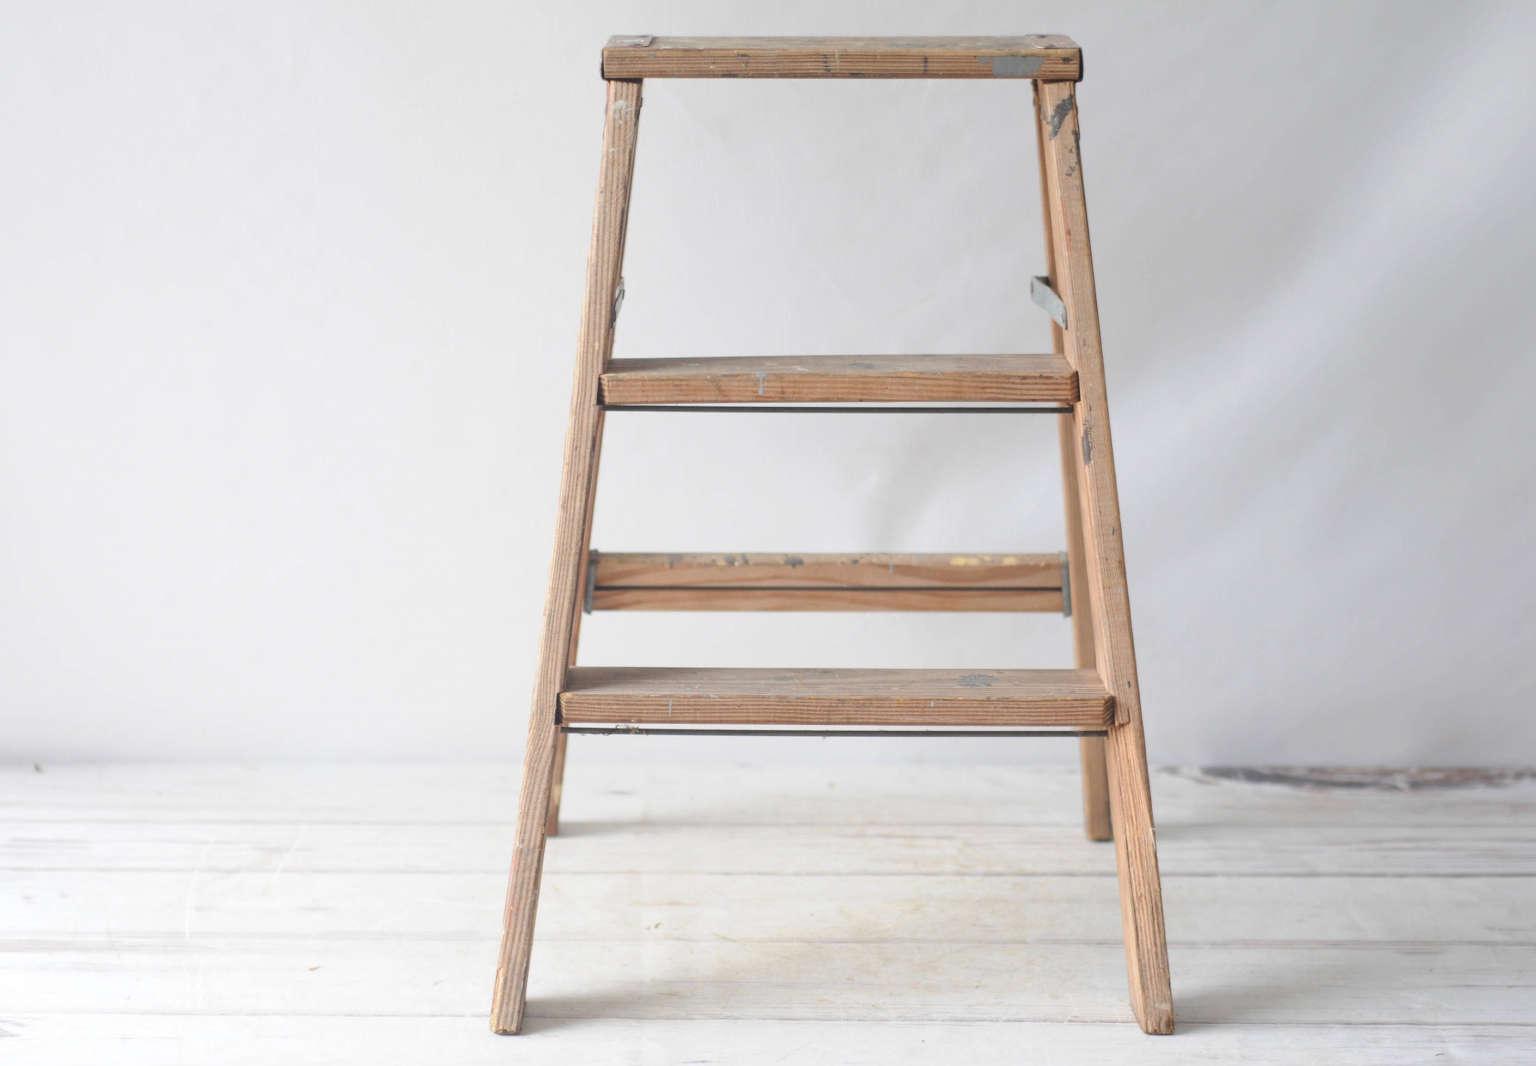 Astonishing Etsy Storage Wooden Ladders Vintage Paint Splatters Pdpeps Interior Chair Design Pdpepsorg